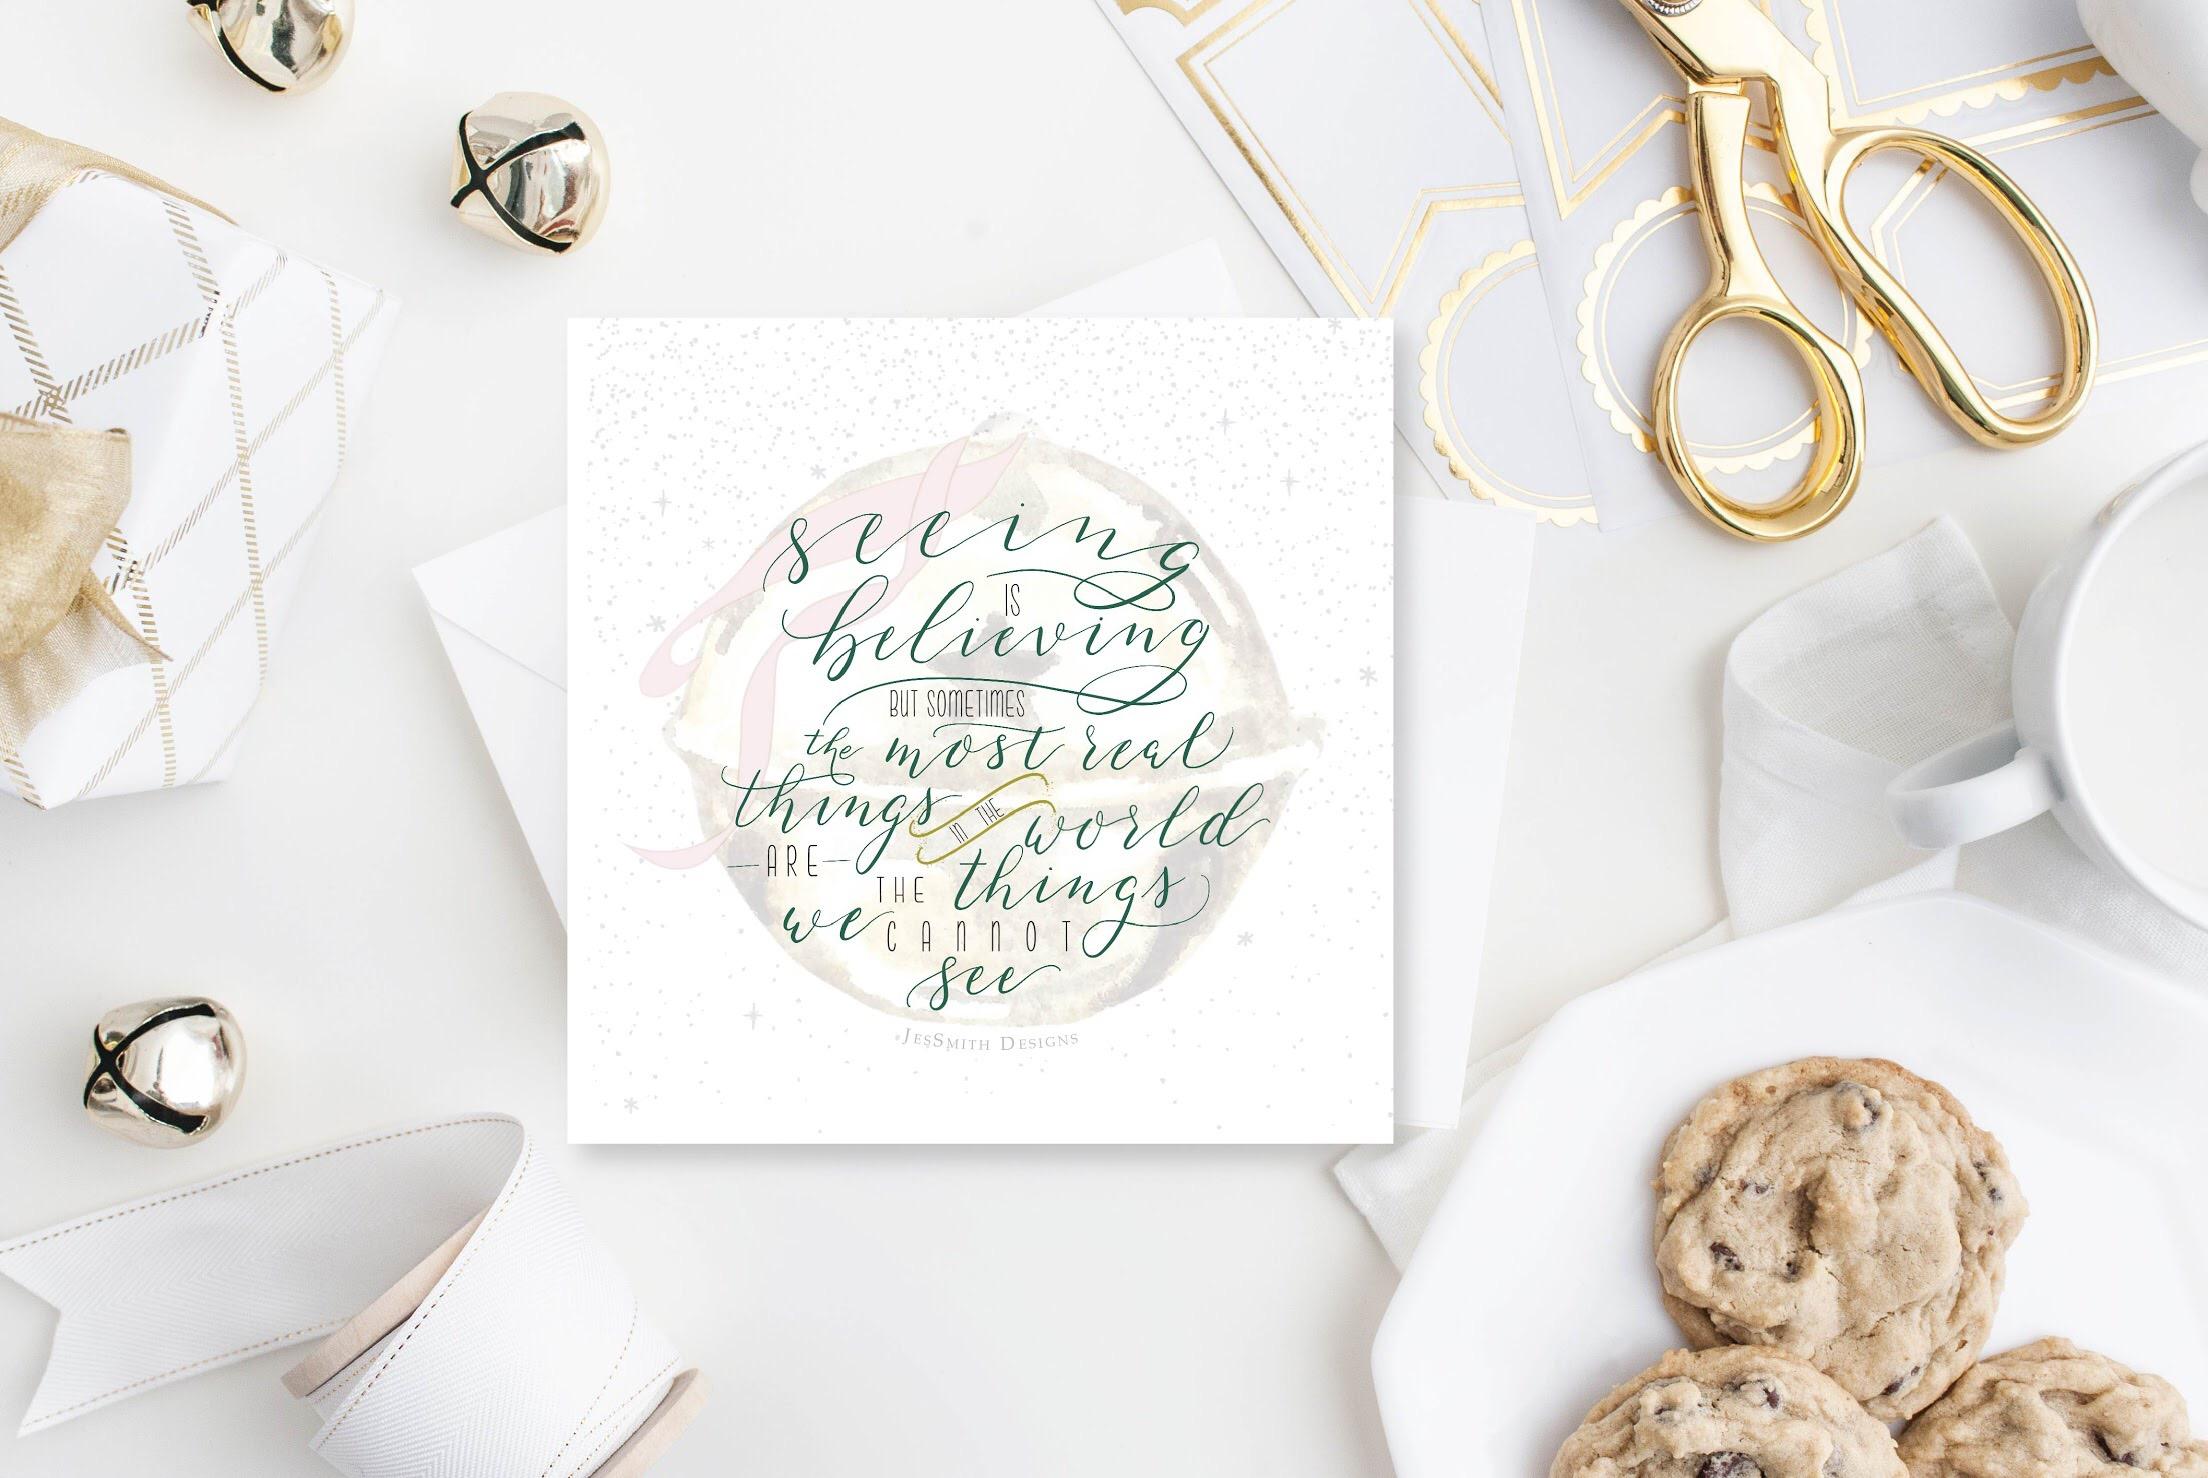 Central PA, York PA, JesSmith Designs, custom, wedding, invitations, bridal, announcements, save the date, baby, hanover, calligraphy, baltimore, wedding invitations, lancaster, gettysburg-12-21 13.31.26.jpg